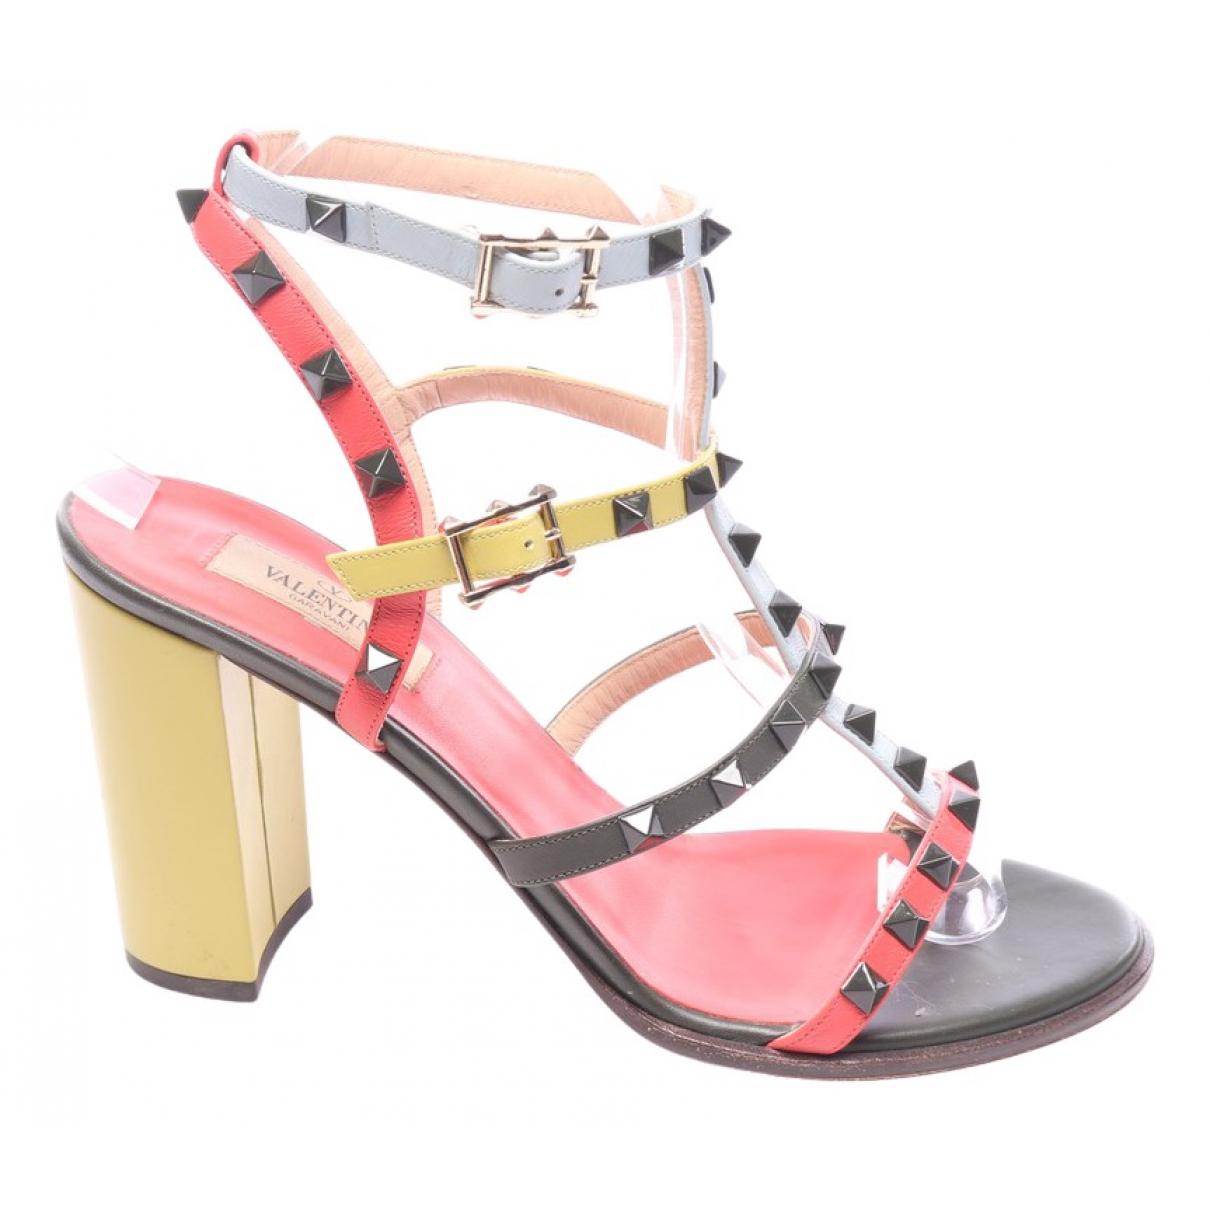 Valentino Garavani Rockstud Multicolour Leather Sandals for Women 41 EU